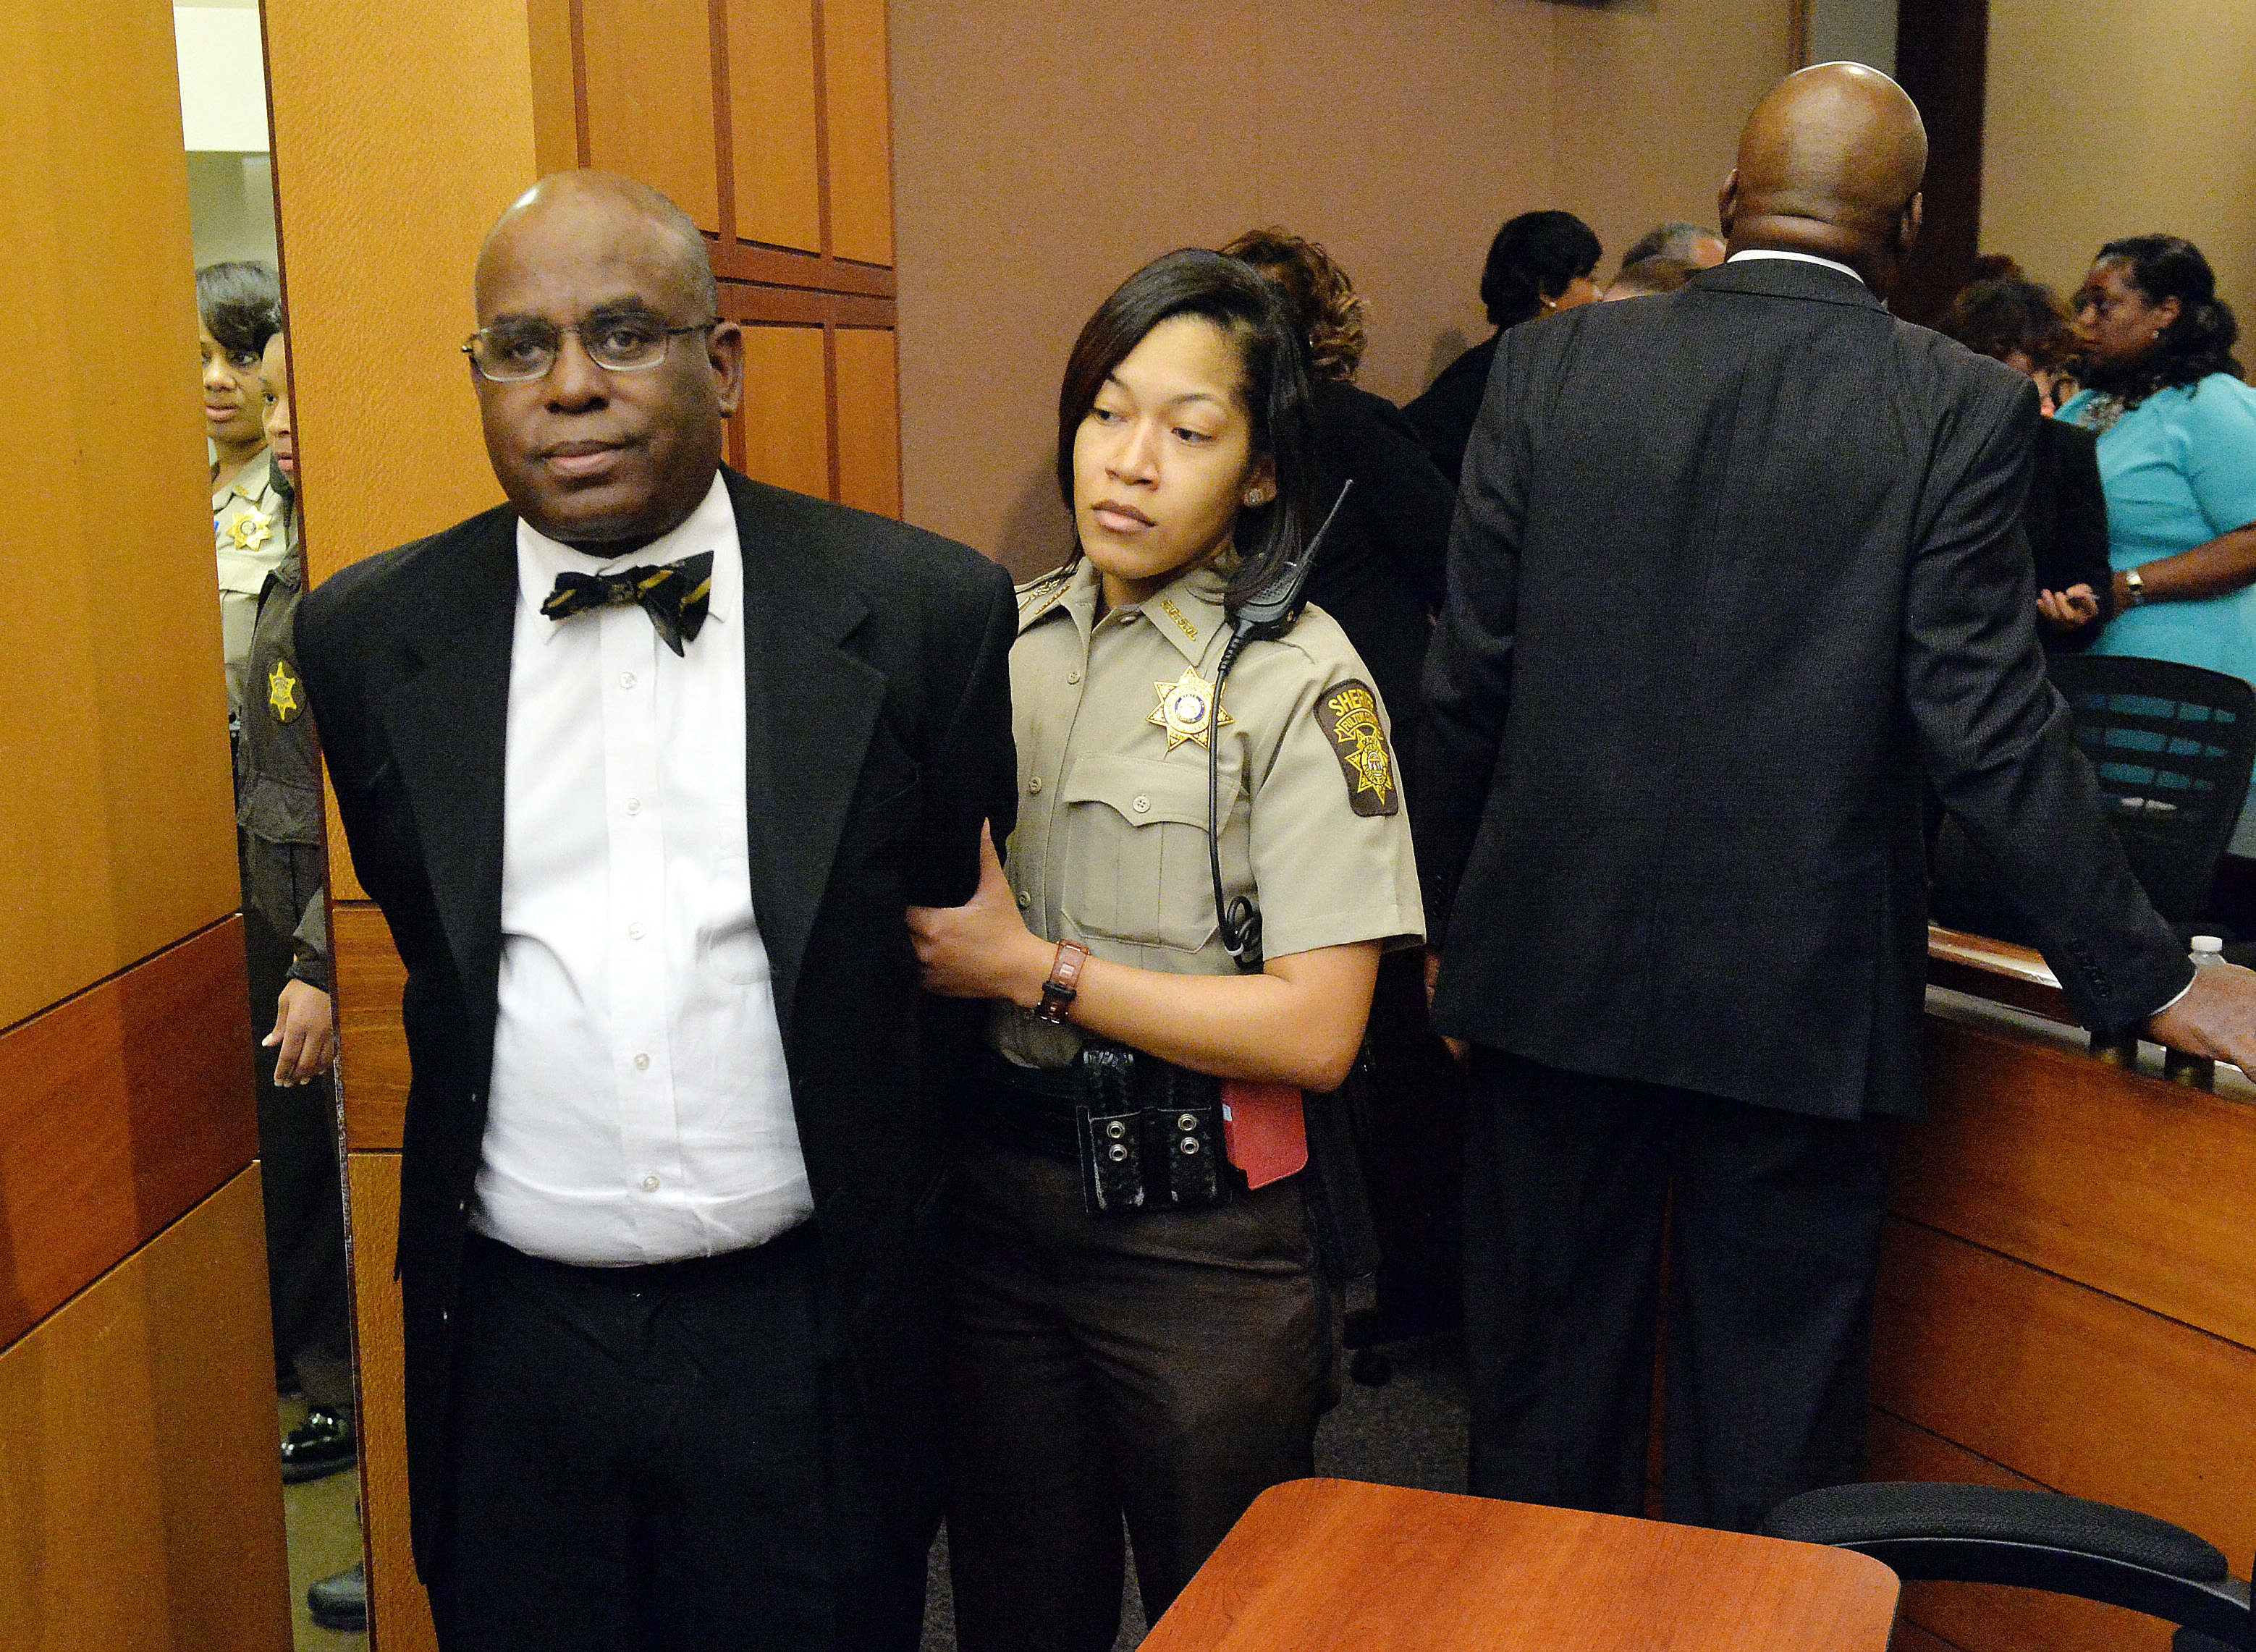 Cheating Case In Atlanta : Atlanta public school cheating scandal former educator accepts